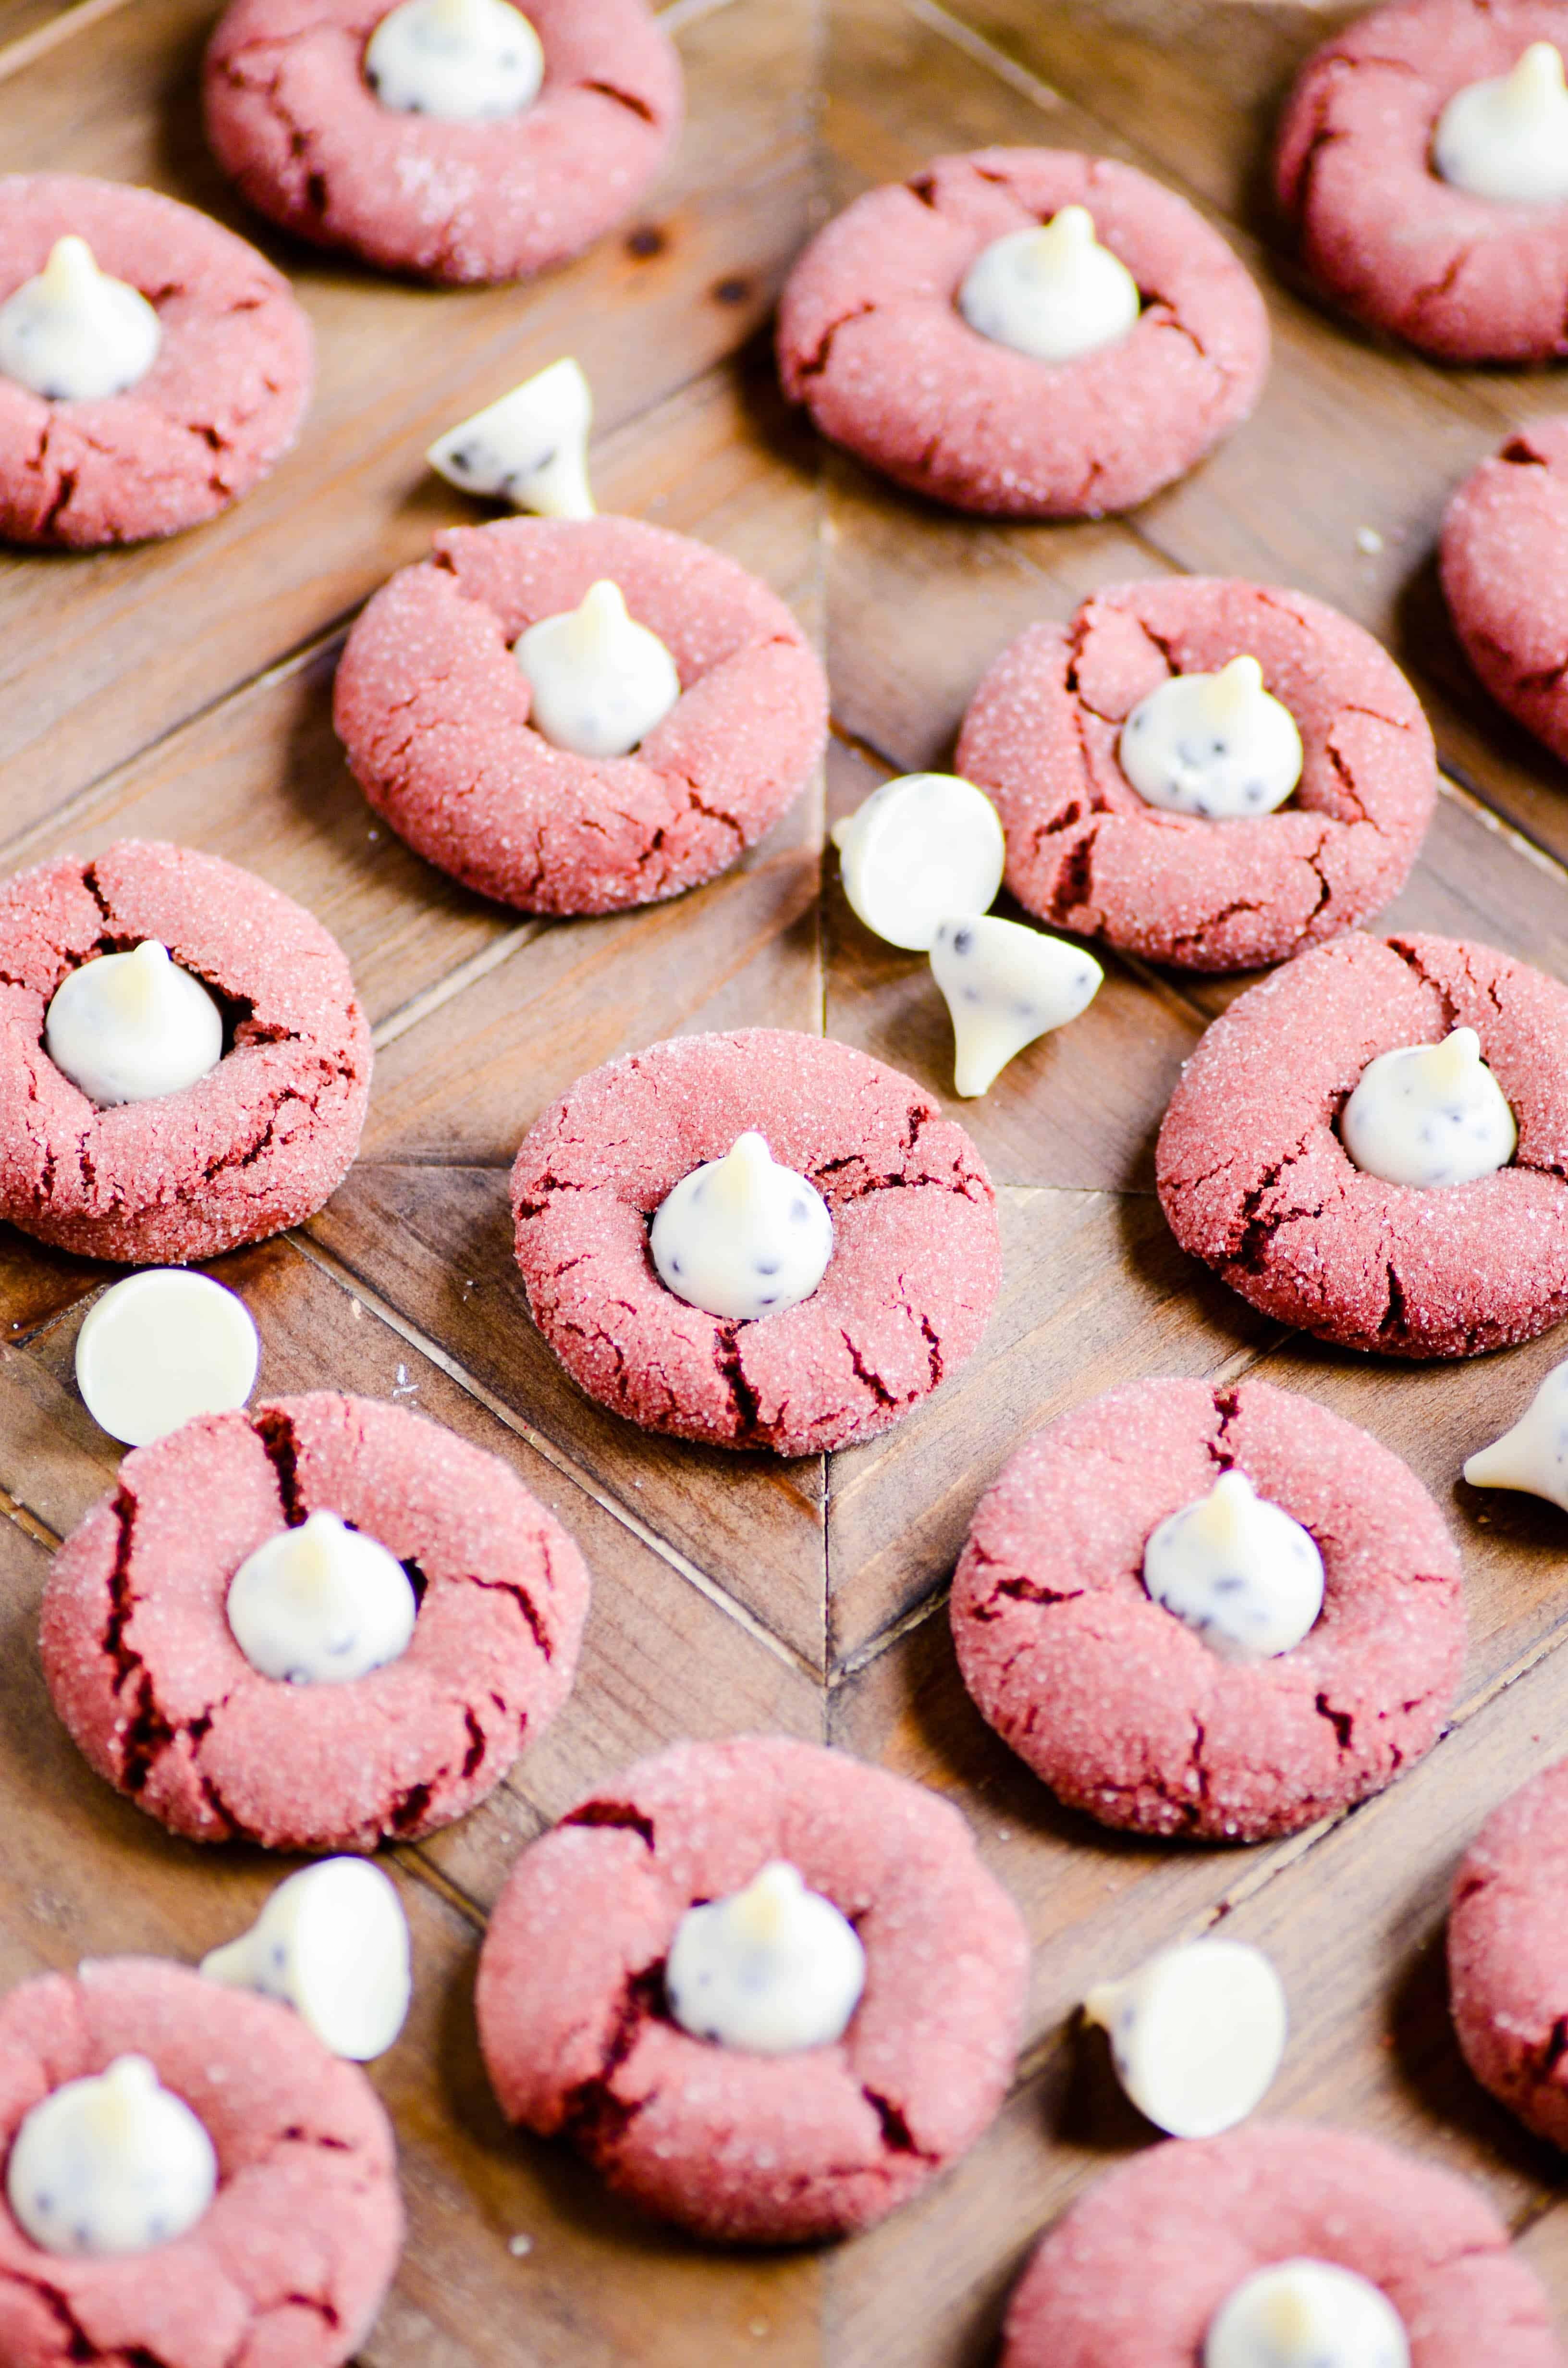 Red Velvet Cookies & Cream Photos